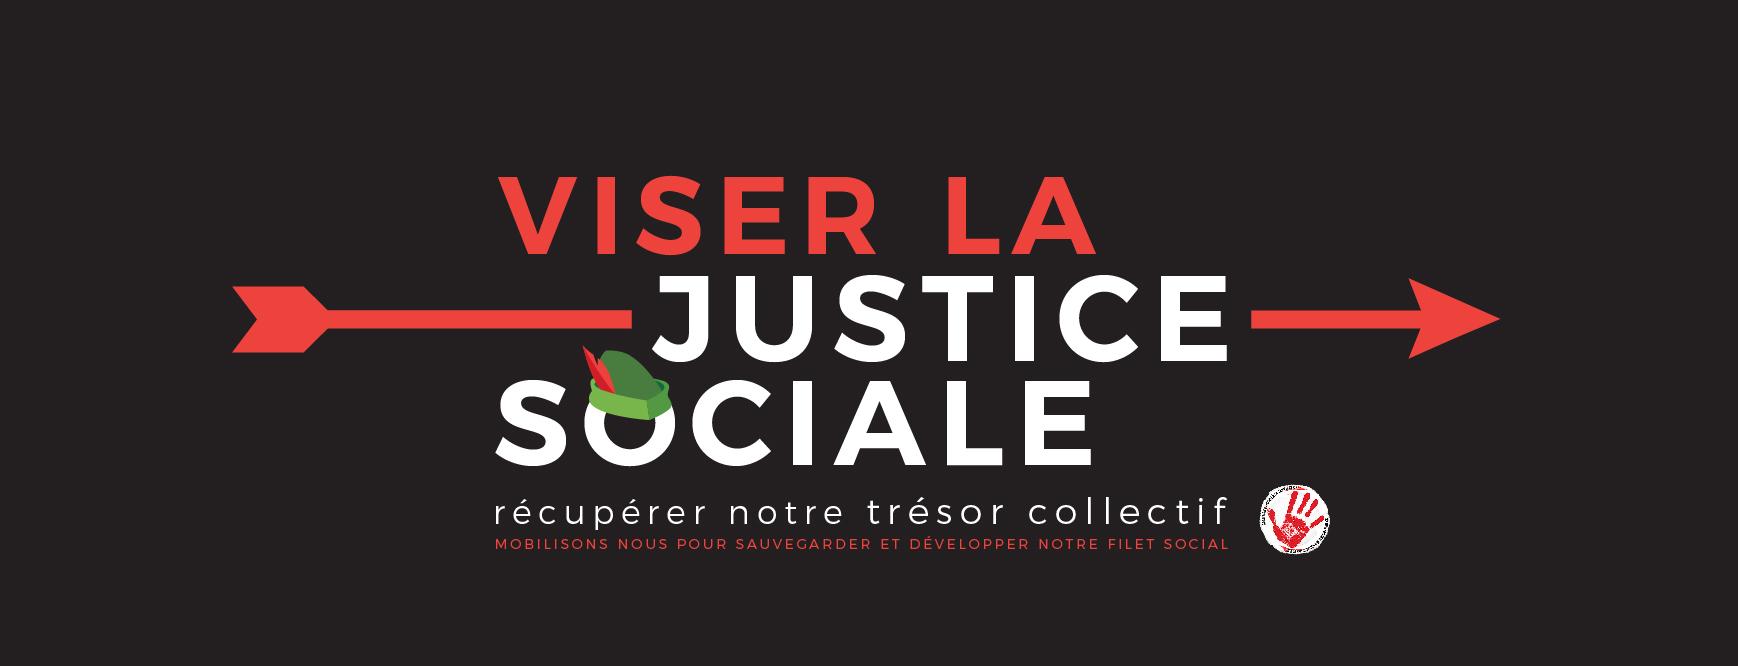 http://nonauxhausses.org/wp-content/uploads/BandeauFB_ViserJusticeSociale.jpg